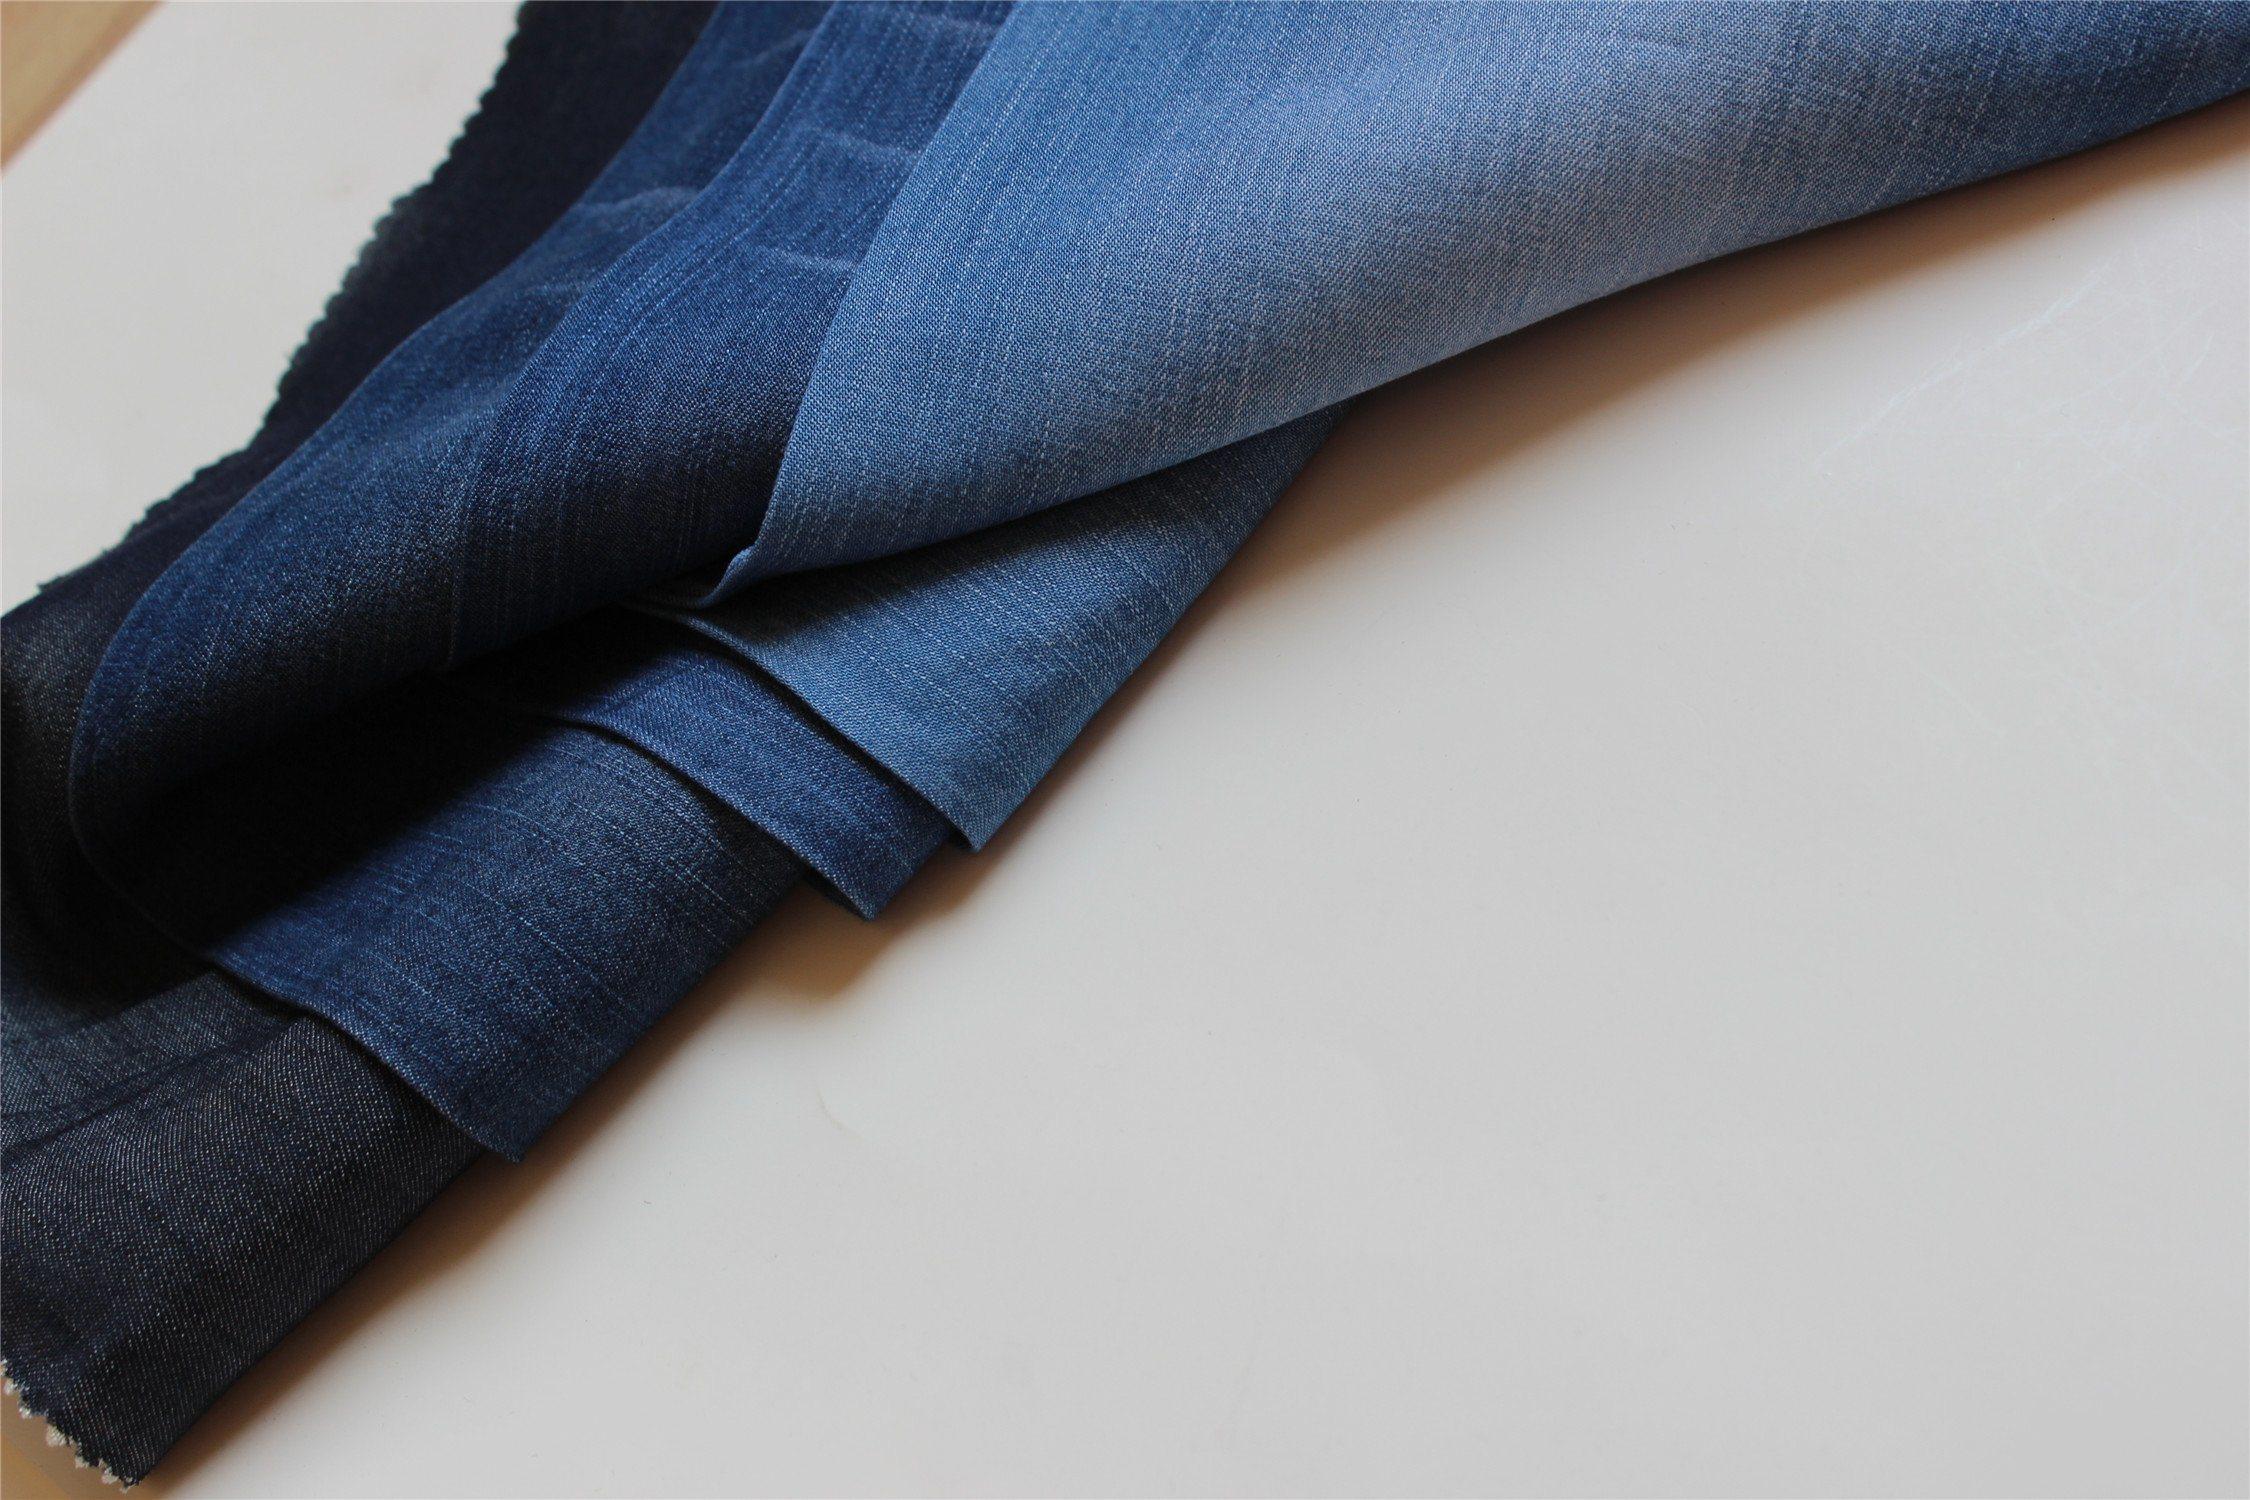 100%Tencel Indigo Denim For Garments